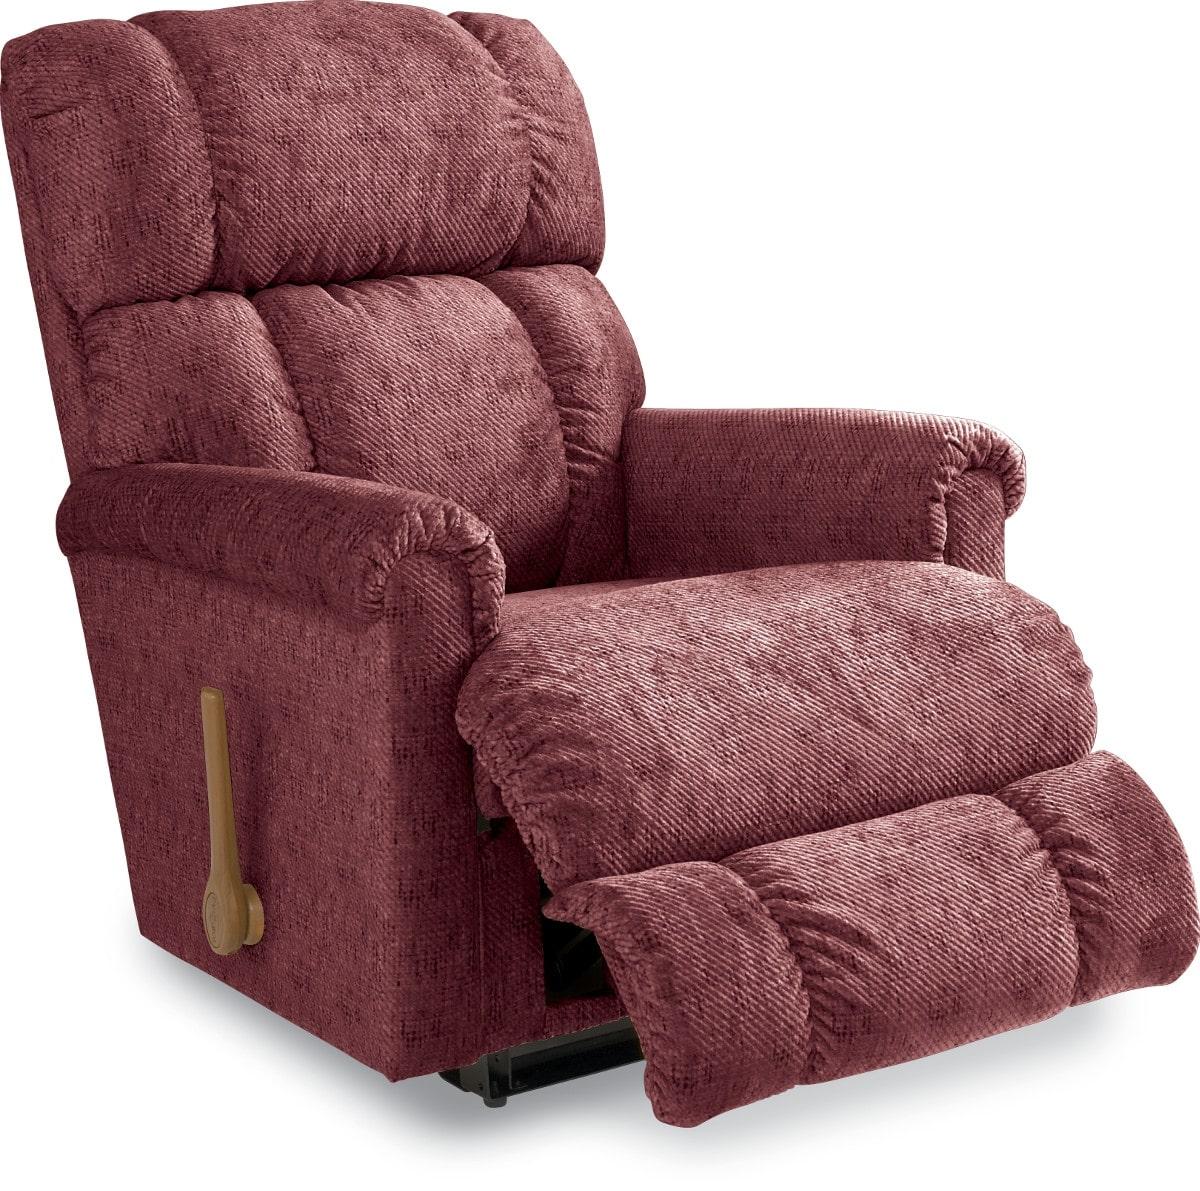 leather sofas cheap prices coronado reclining sofa la-z-boy furniture